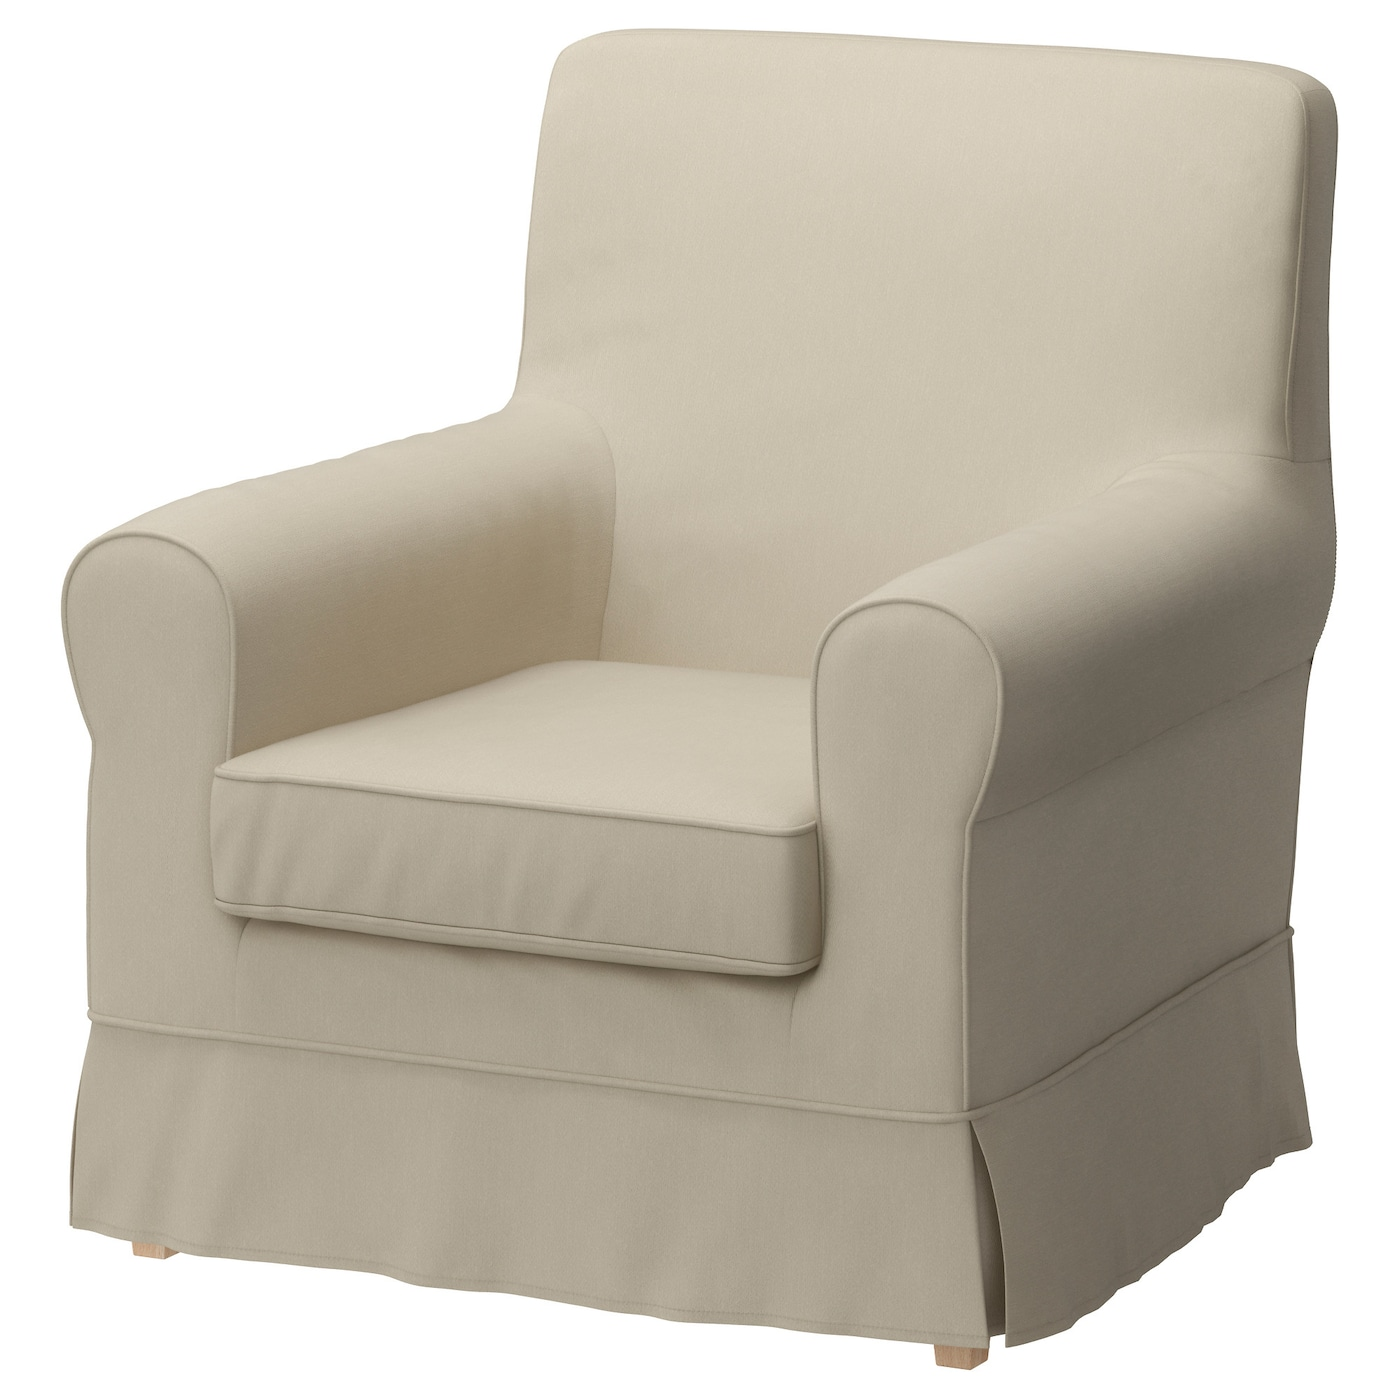 JENNYLUND Armchair cover Ramna beige IKEA